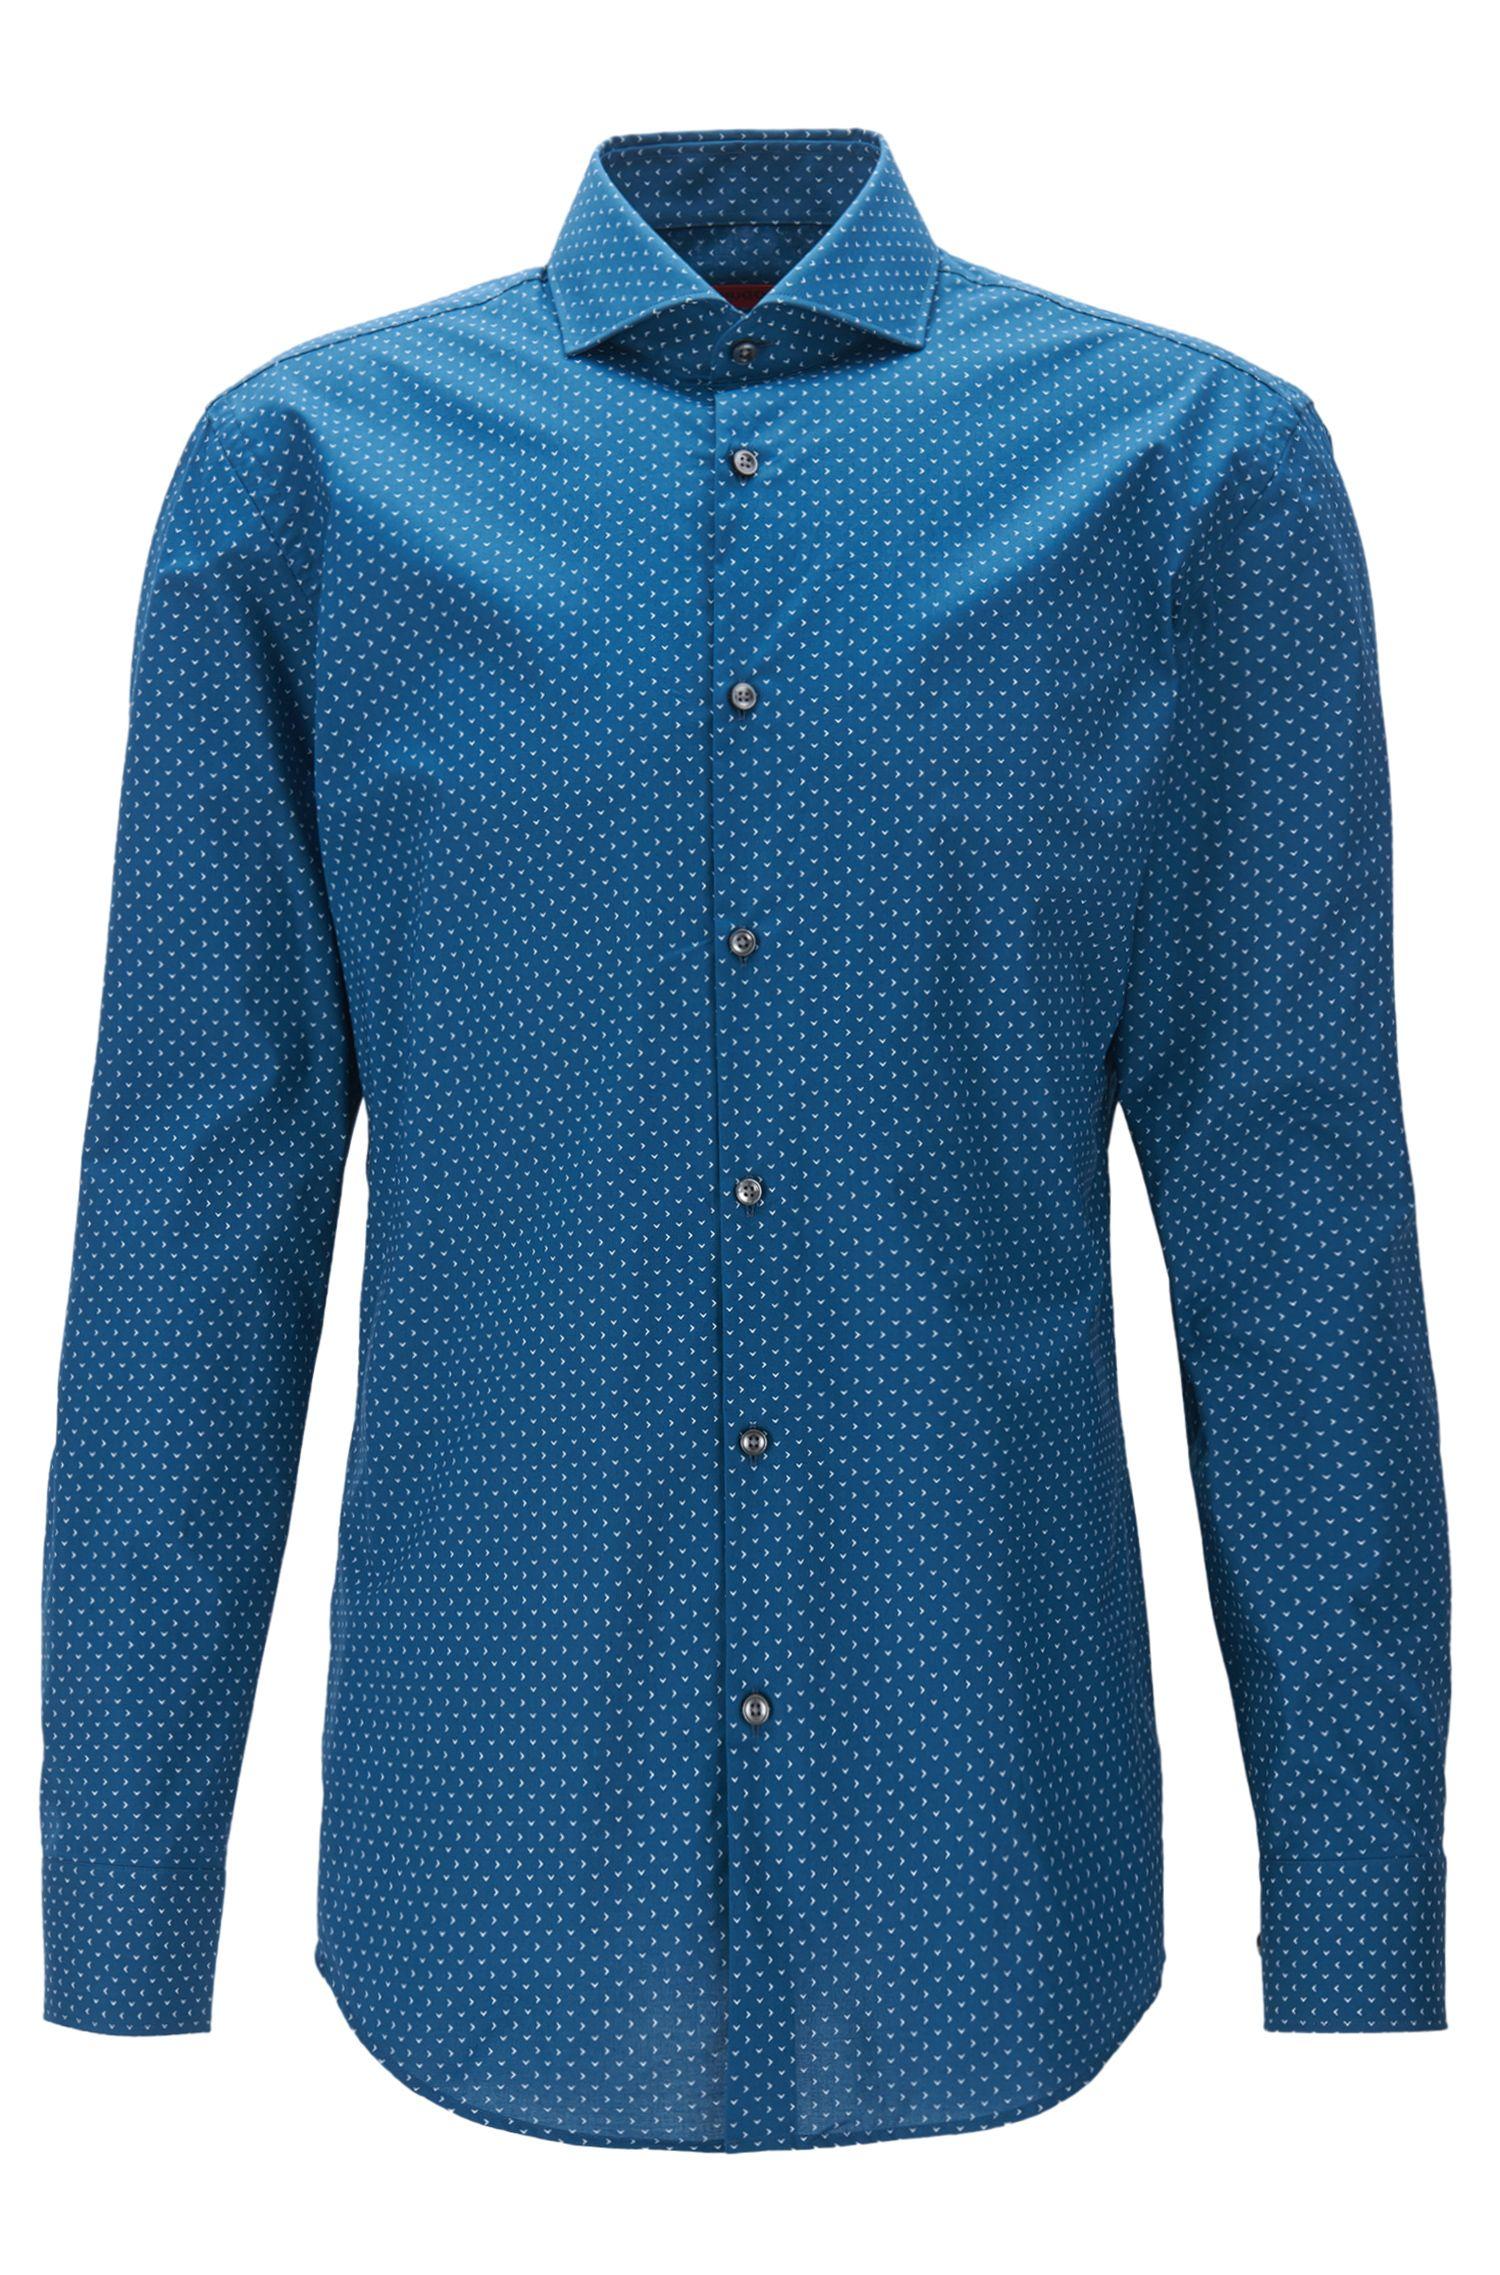 Slim-fit overhemd van katoenpopeline met print